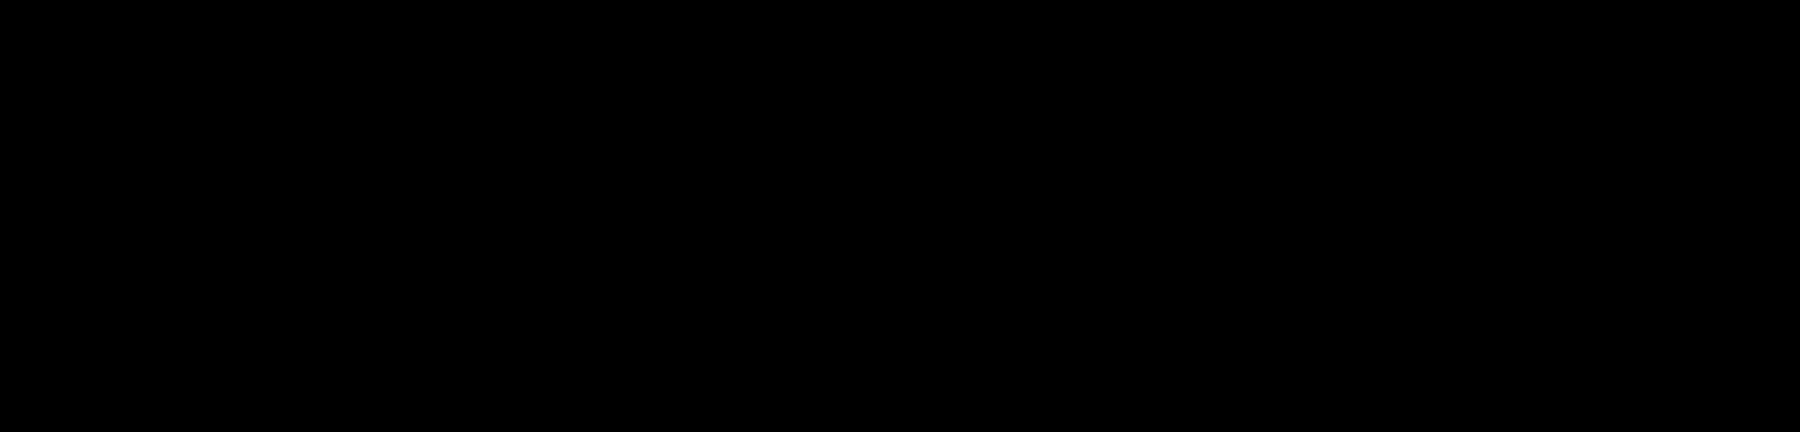 (R)-Pramipexole dihydrochloride